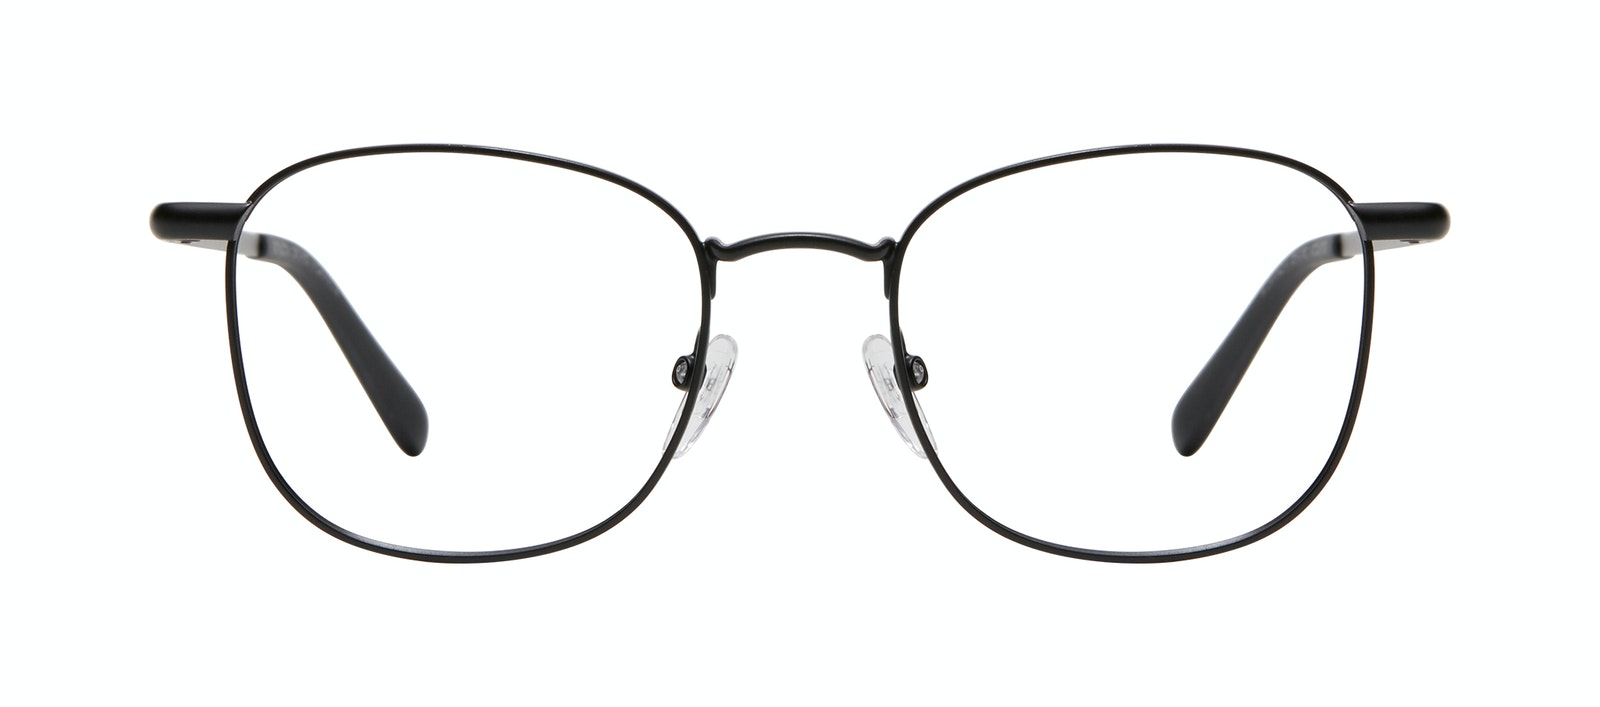 Affordable Fashion Glasses Square Eyeglasses Men Women Apex M Matte Black Front